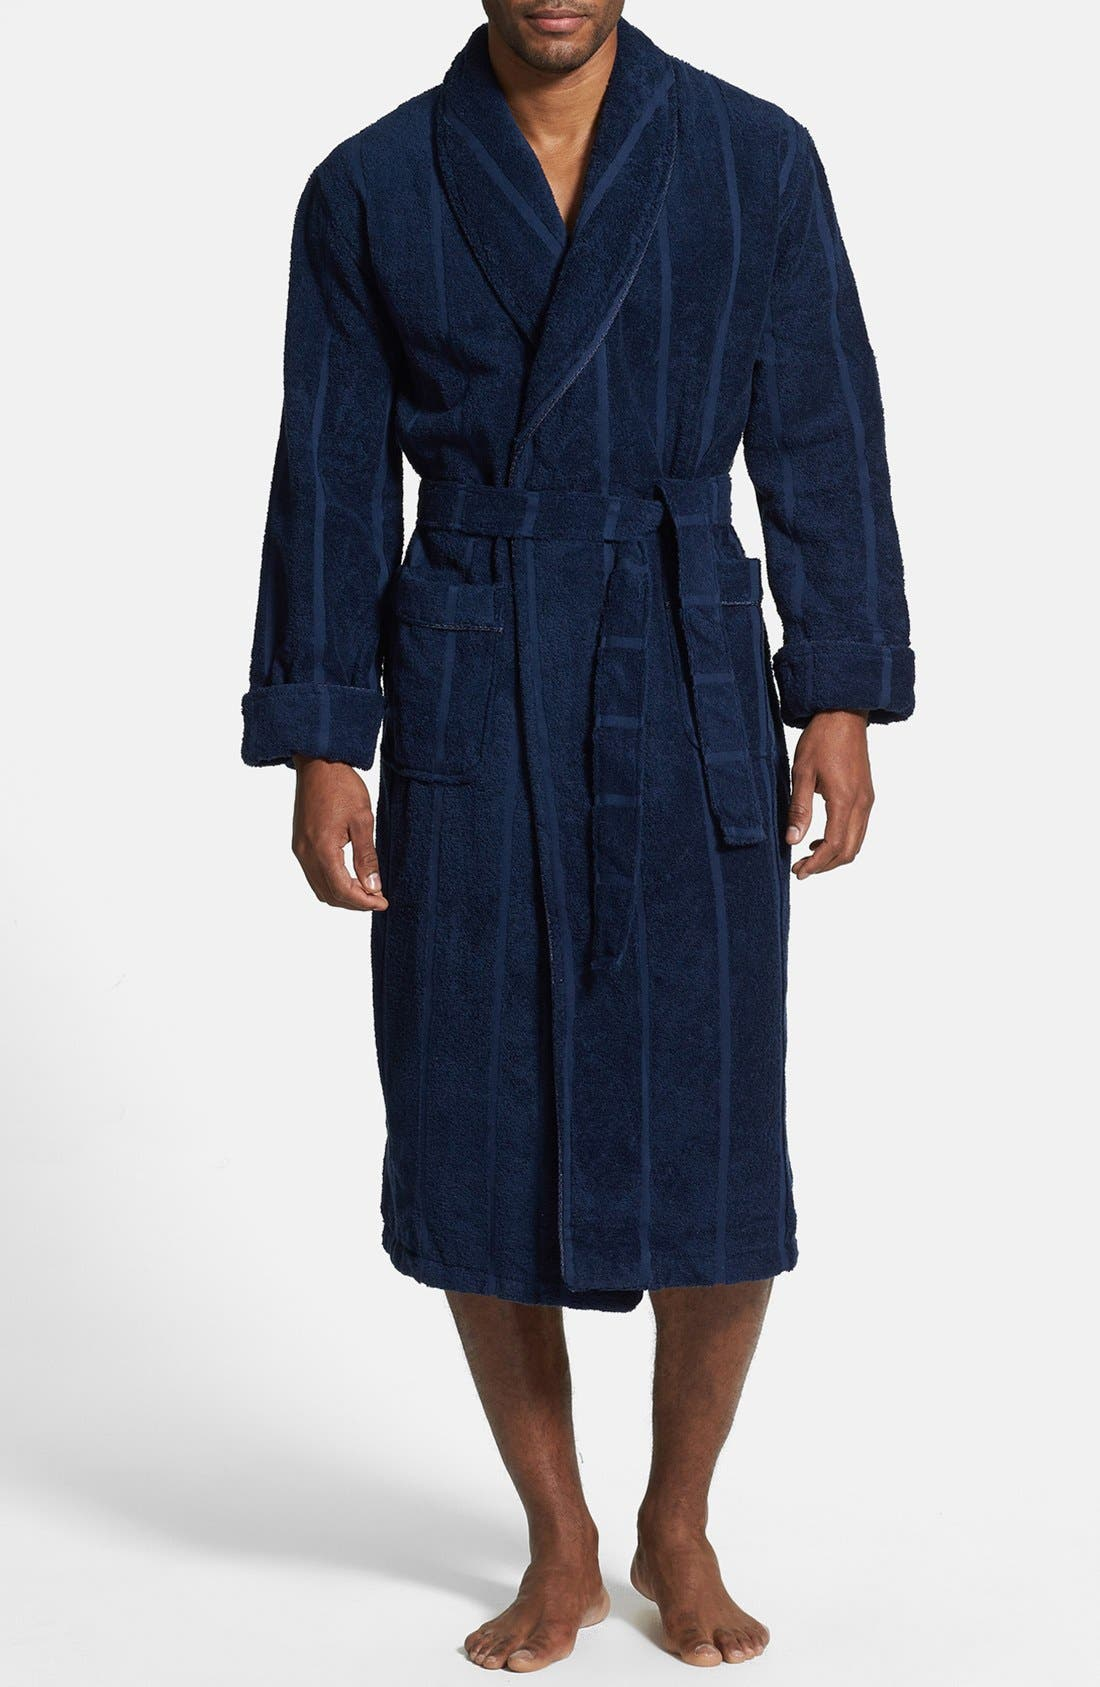 Ultra Lux Robe,                         Main,                         color, Marine